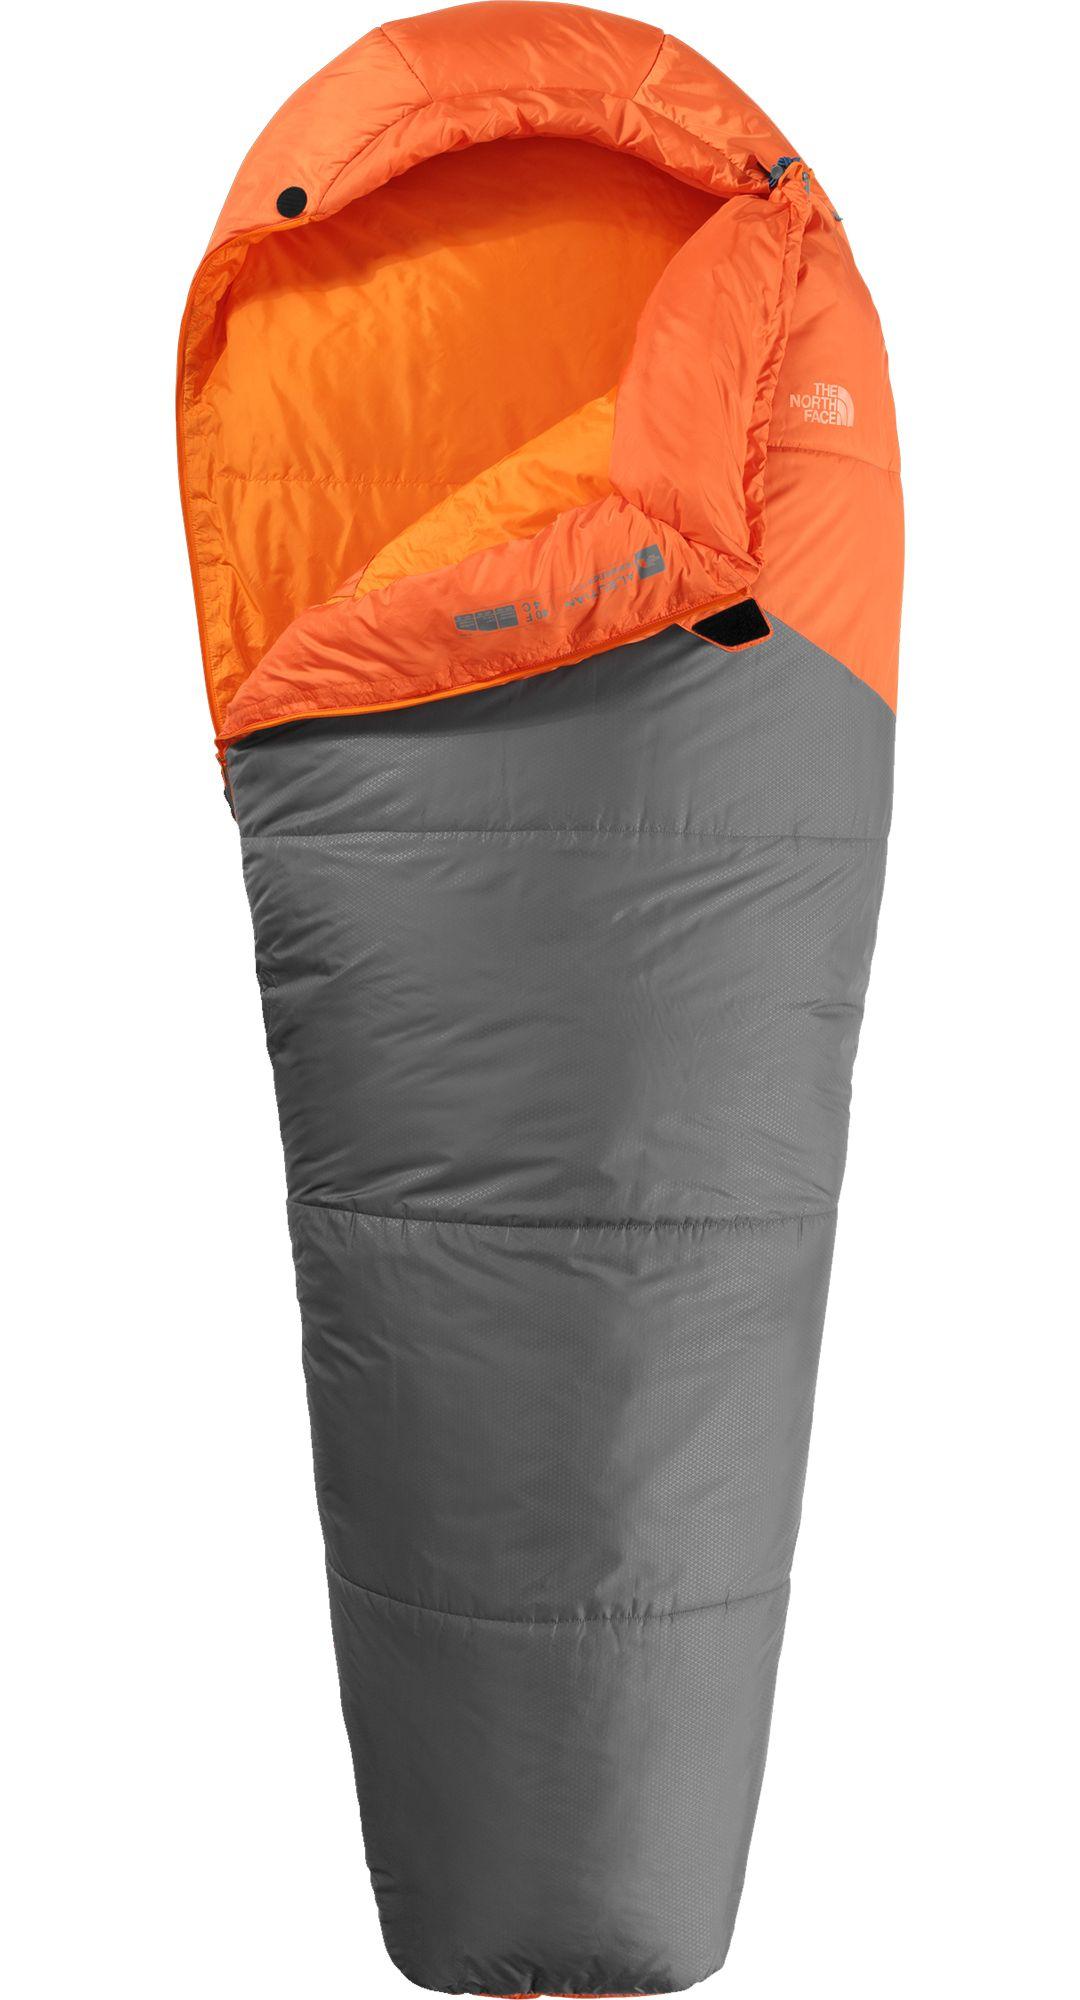 bc8f642f1 The North Face Aleutian 40° Sleeping Bag